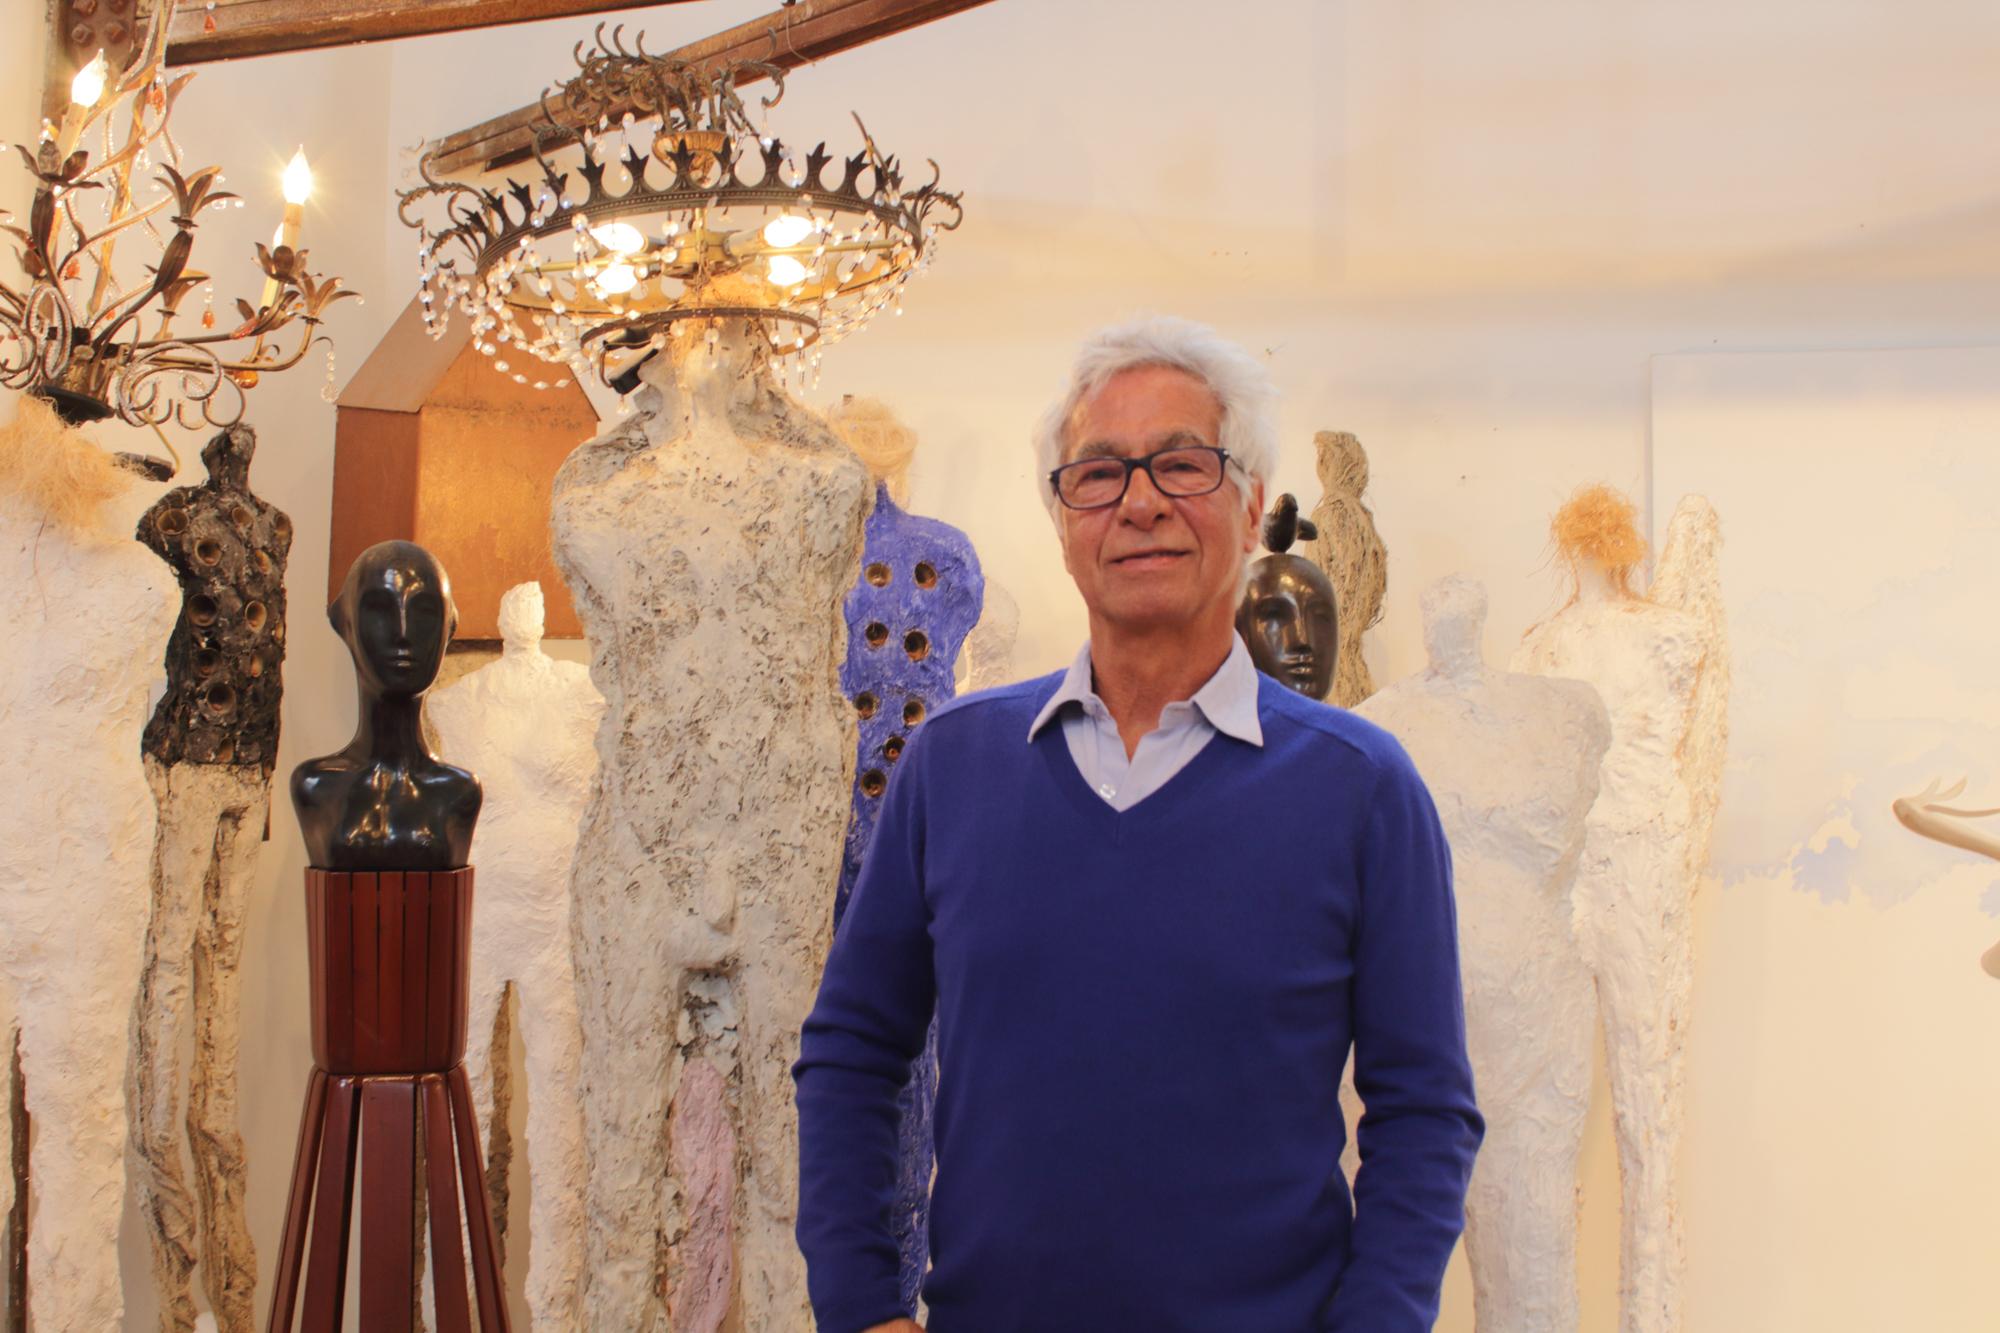 Santa Monica Art Studio Director and sculptor, Yossi Govrin, photographed in his studio located in the Santa Monica Art Studios at the 12 Annual Santa Monica ArtWalk on March 24th, 2018 in Santa Monica, California. (Heather Creamer/ Corsair Photo).